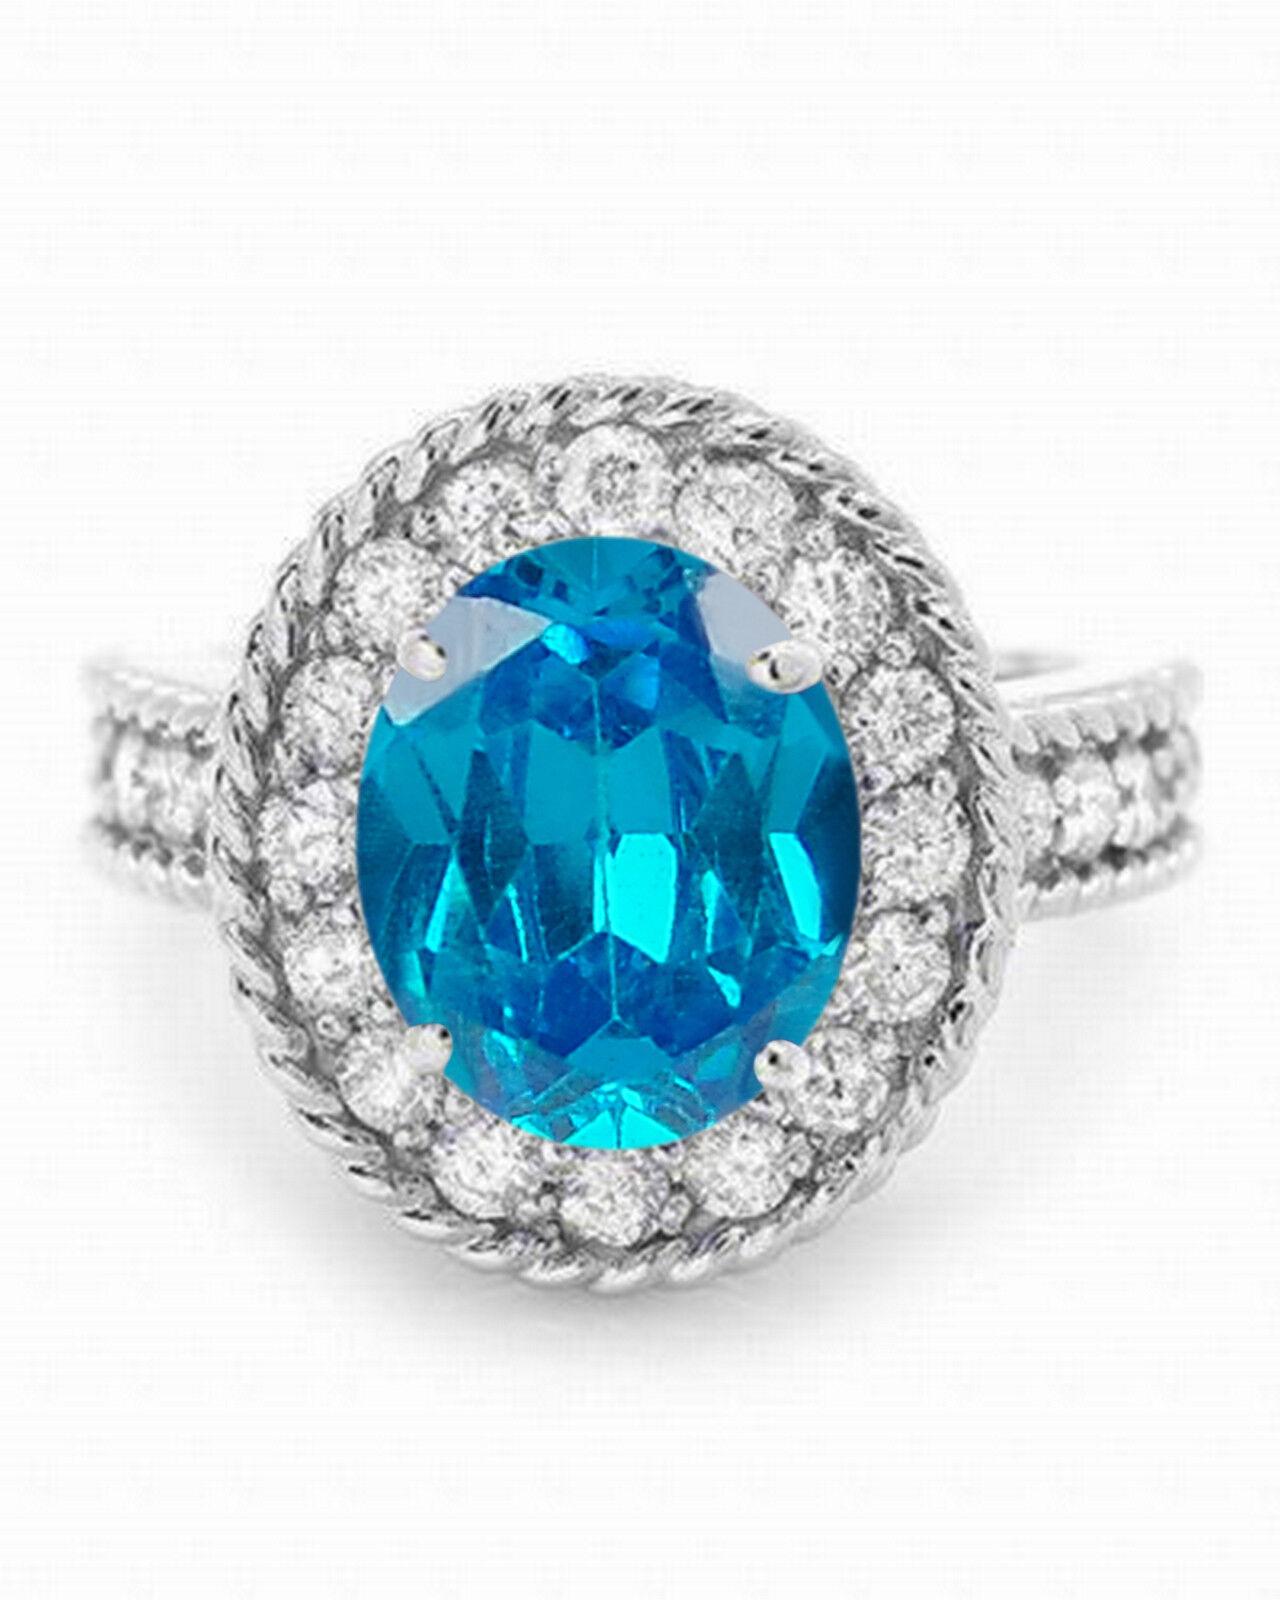 2.10 Carat Natural bluee Topaz EGL Certified Diamond Ring In 14KT White gold